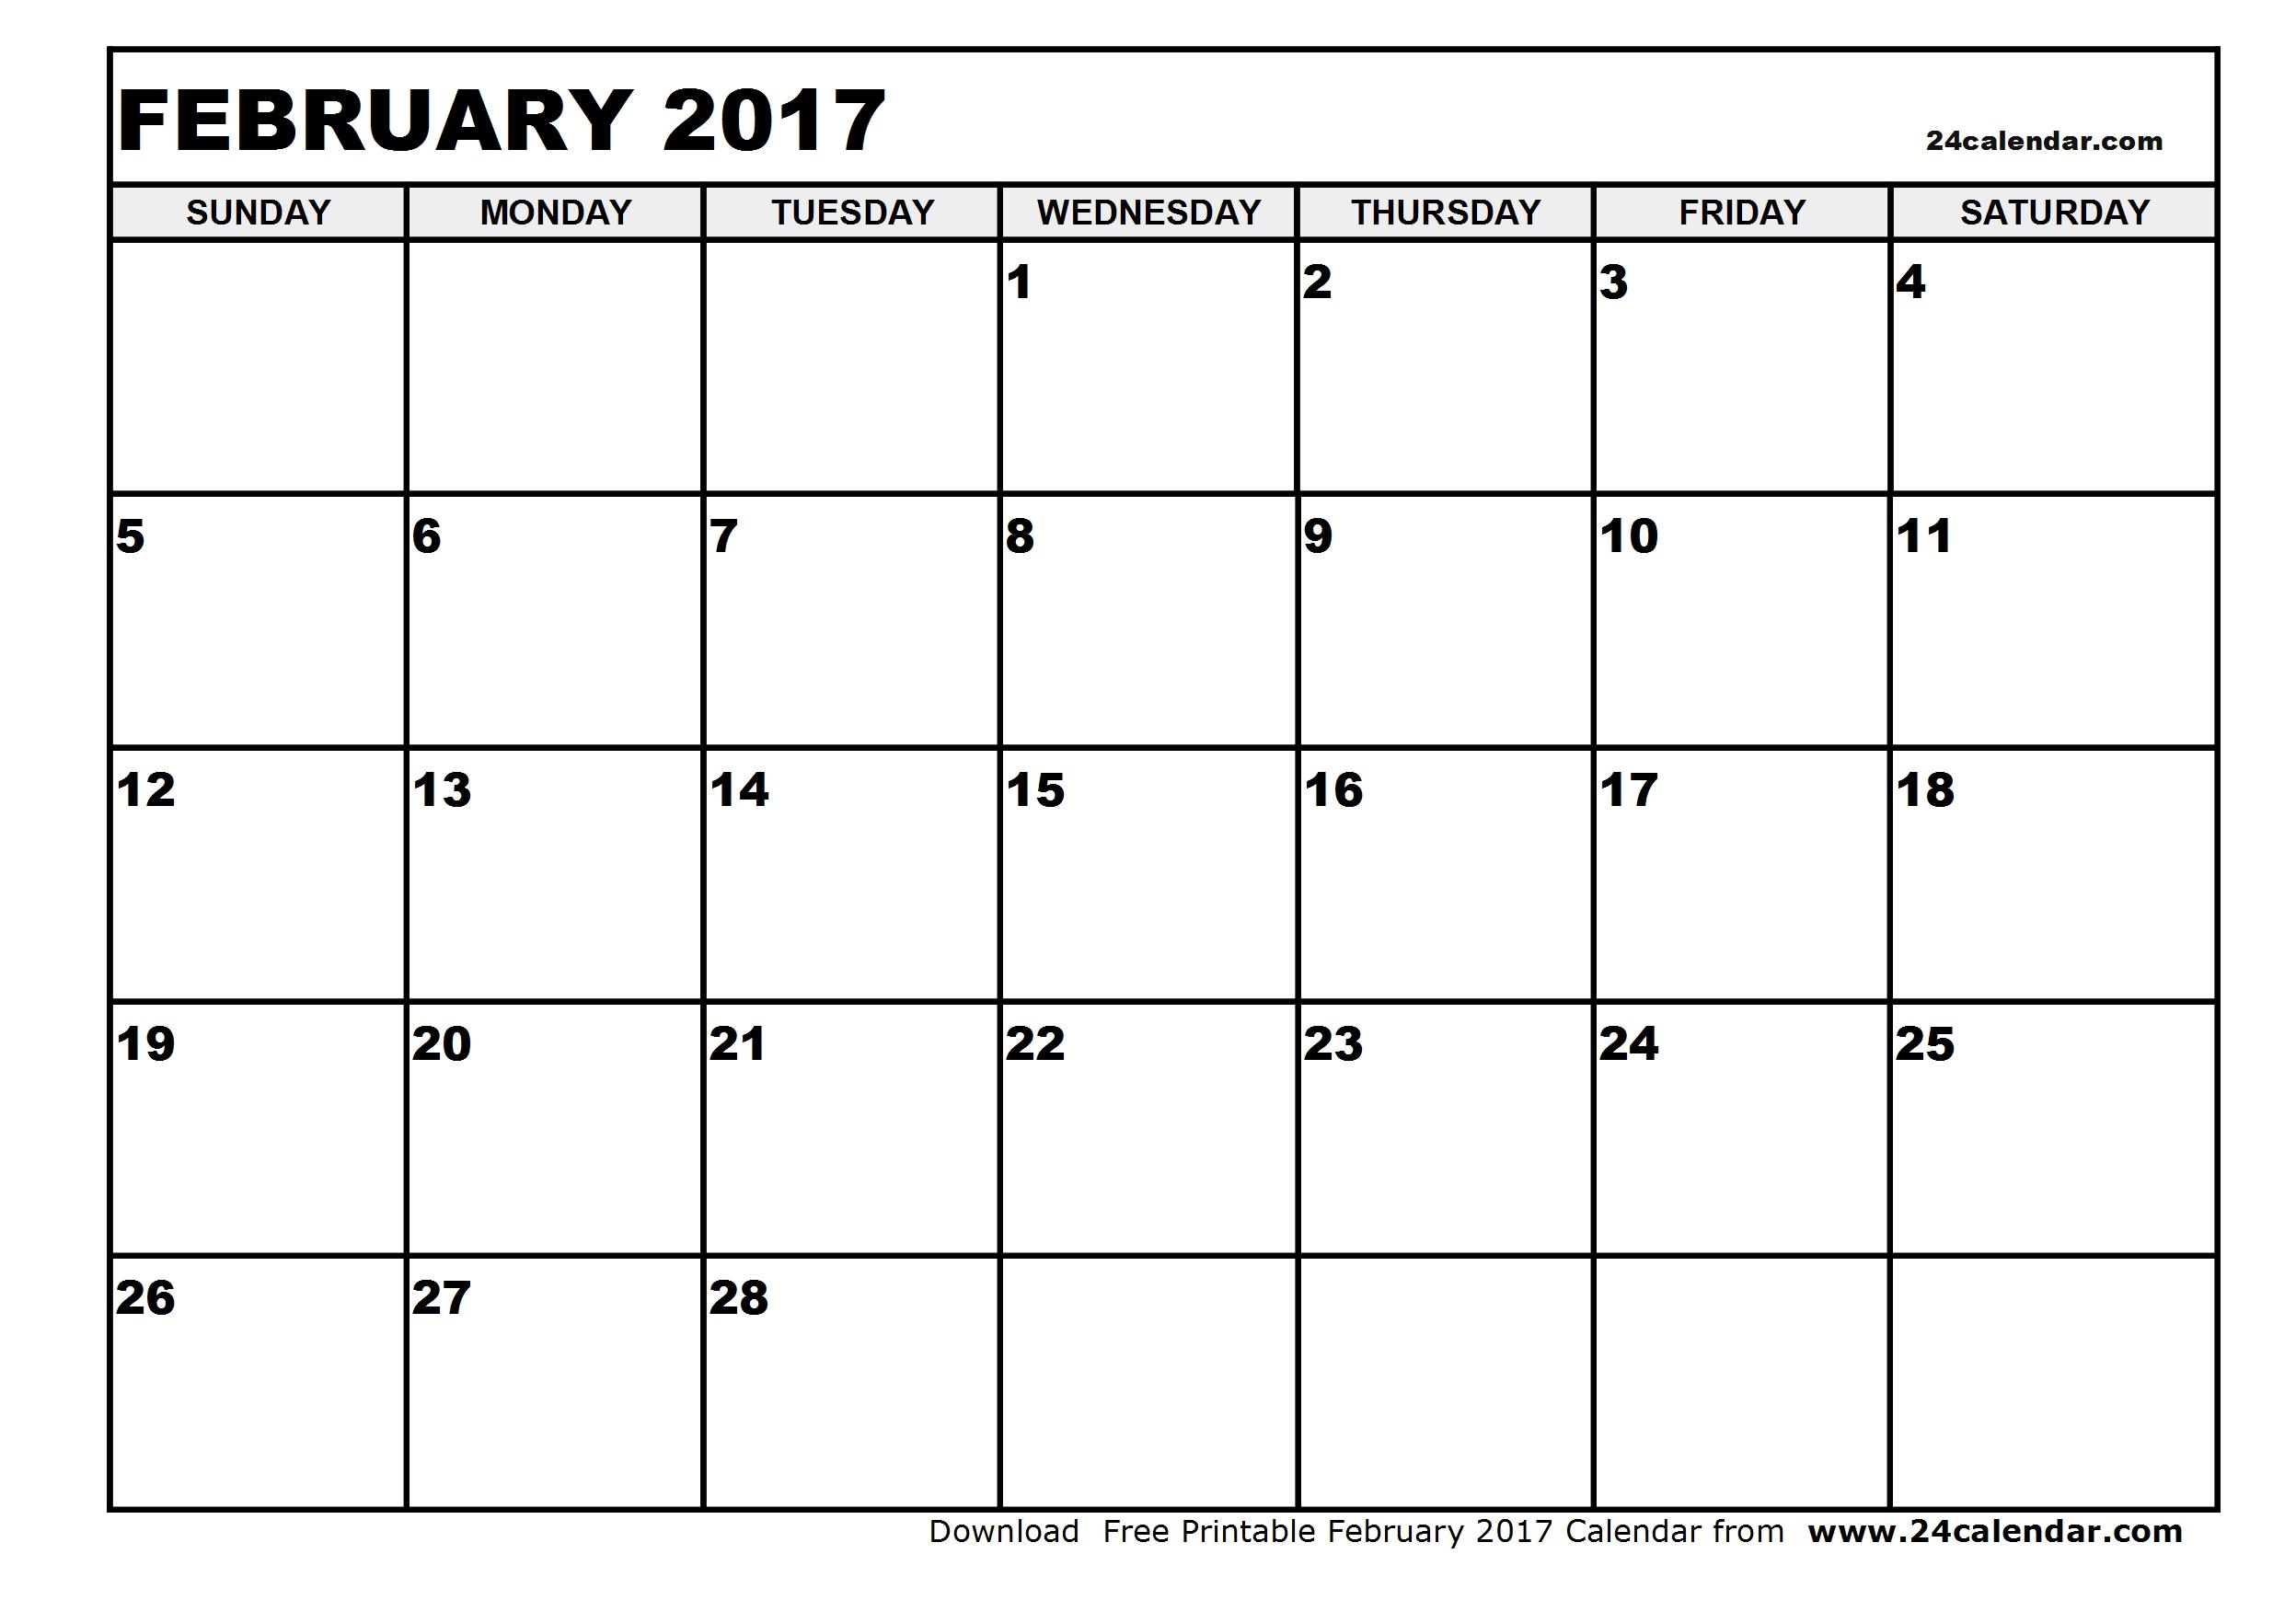 February 2017 Calendar Excel Template